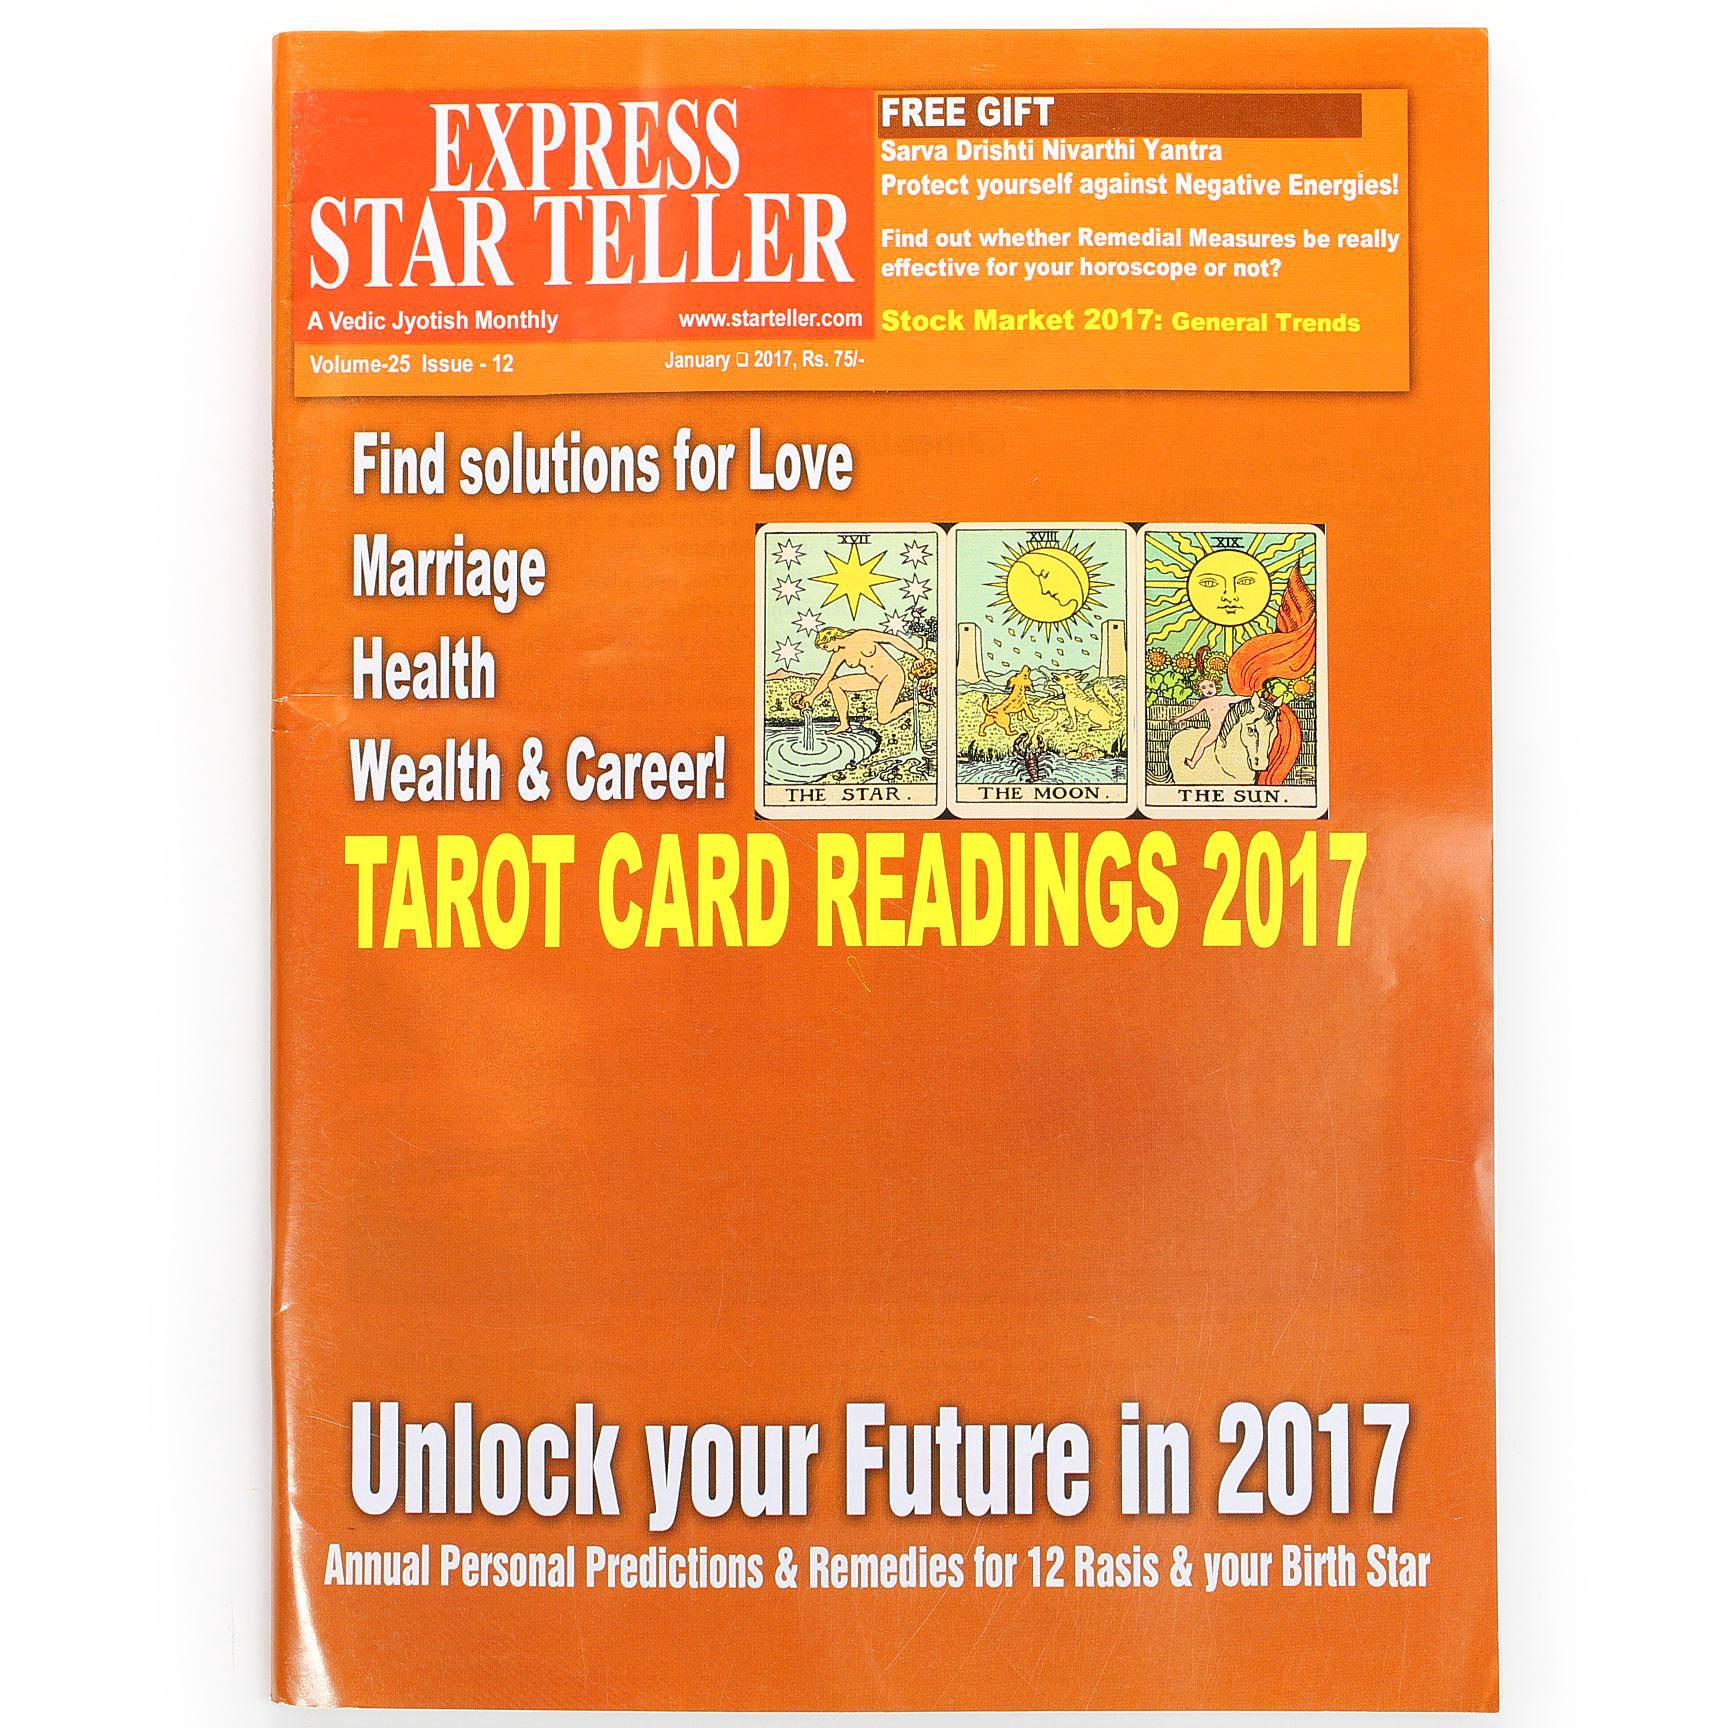 STAR TELLER 2017年1月号(ドリシュティ・ニヴァルティ(厄除け)・ヤントラ付き)